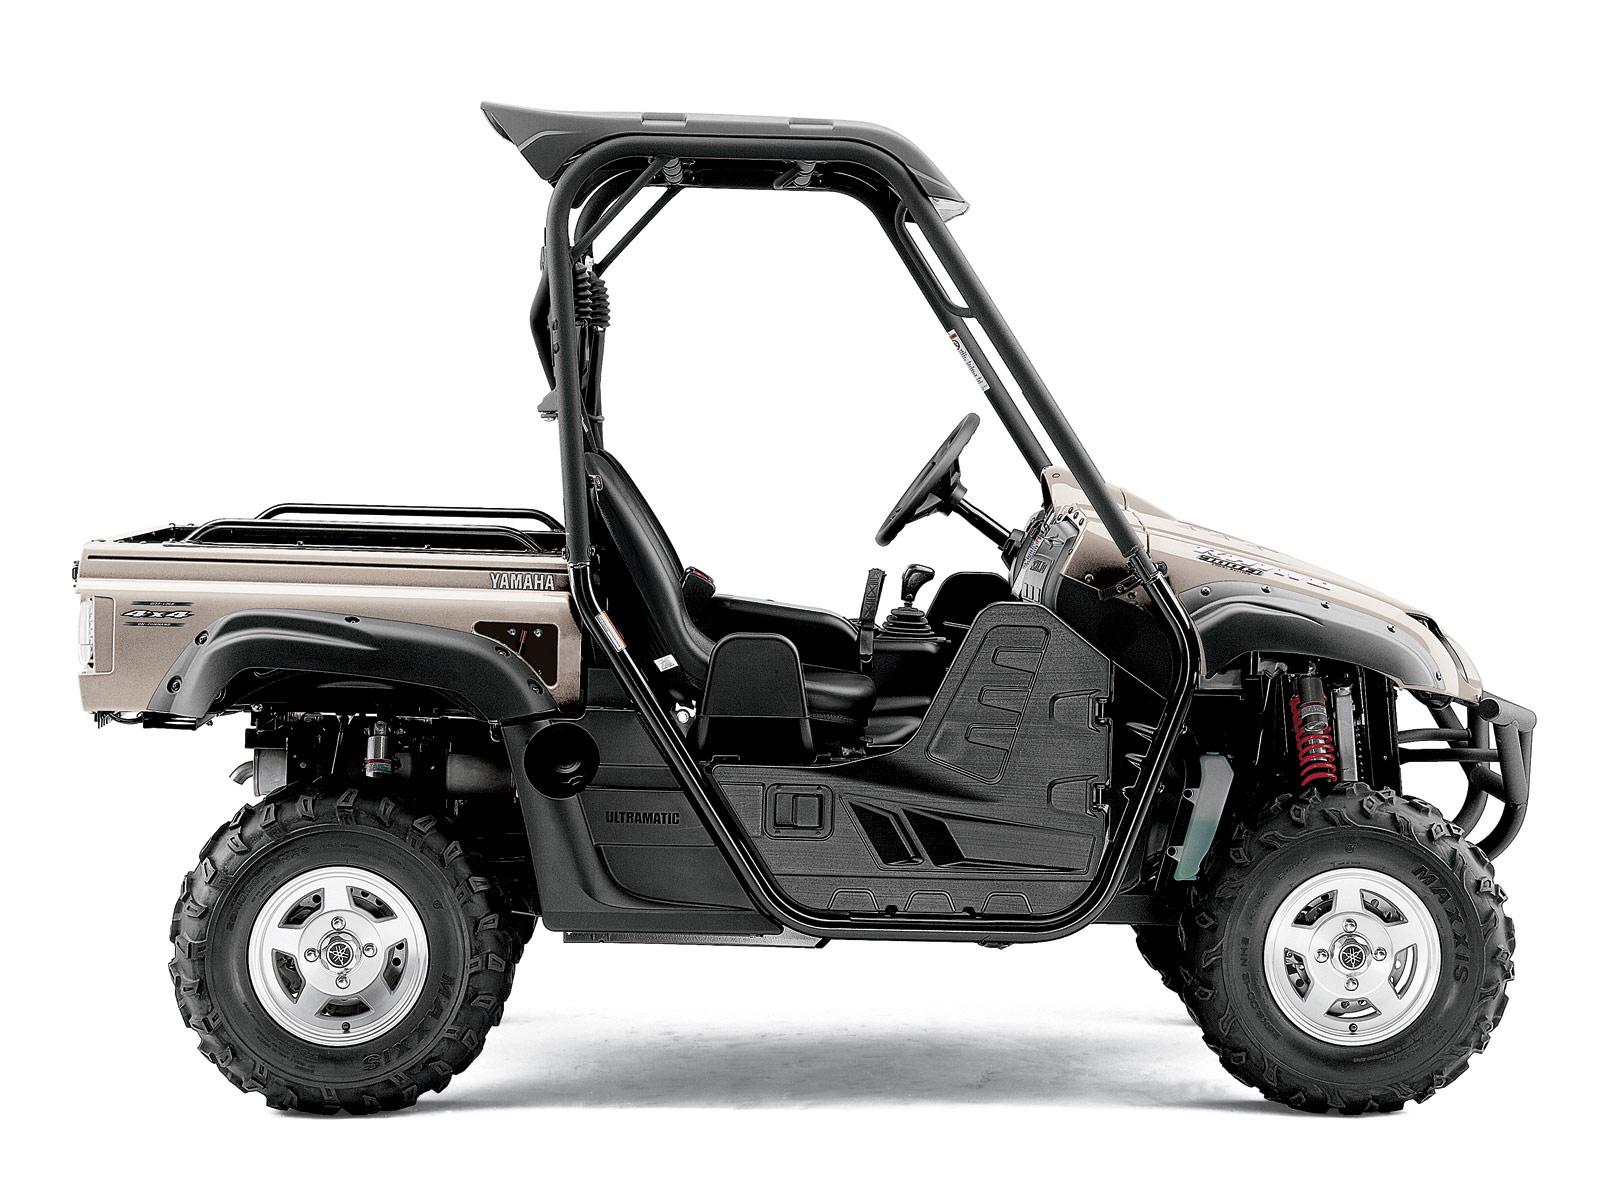 Yamaha Rhino 700